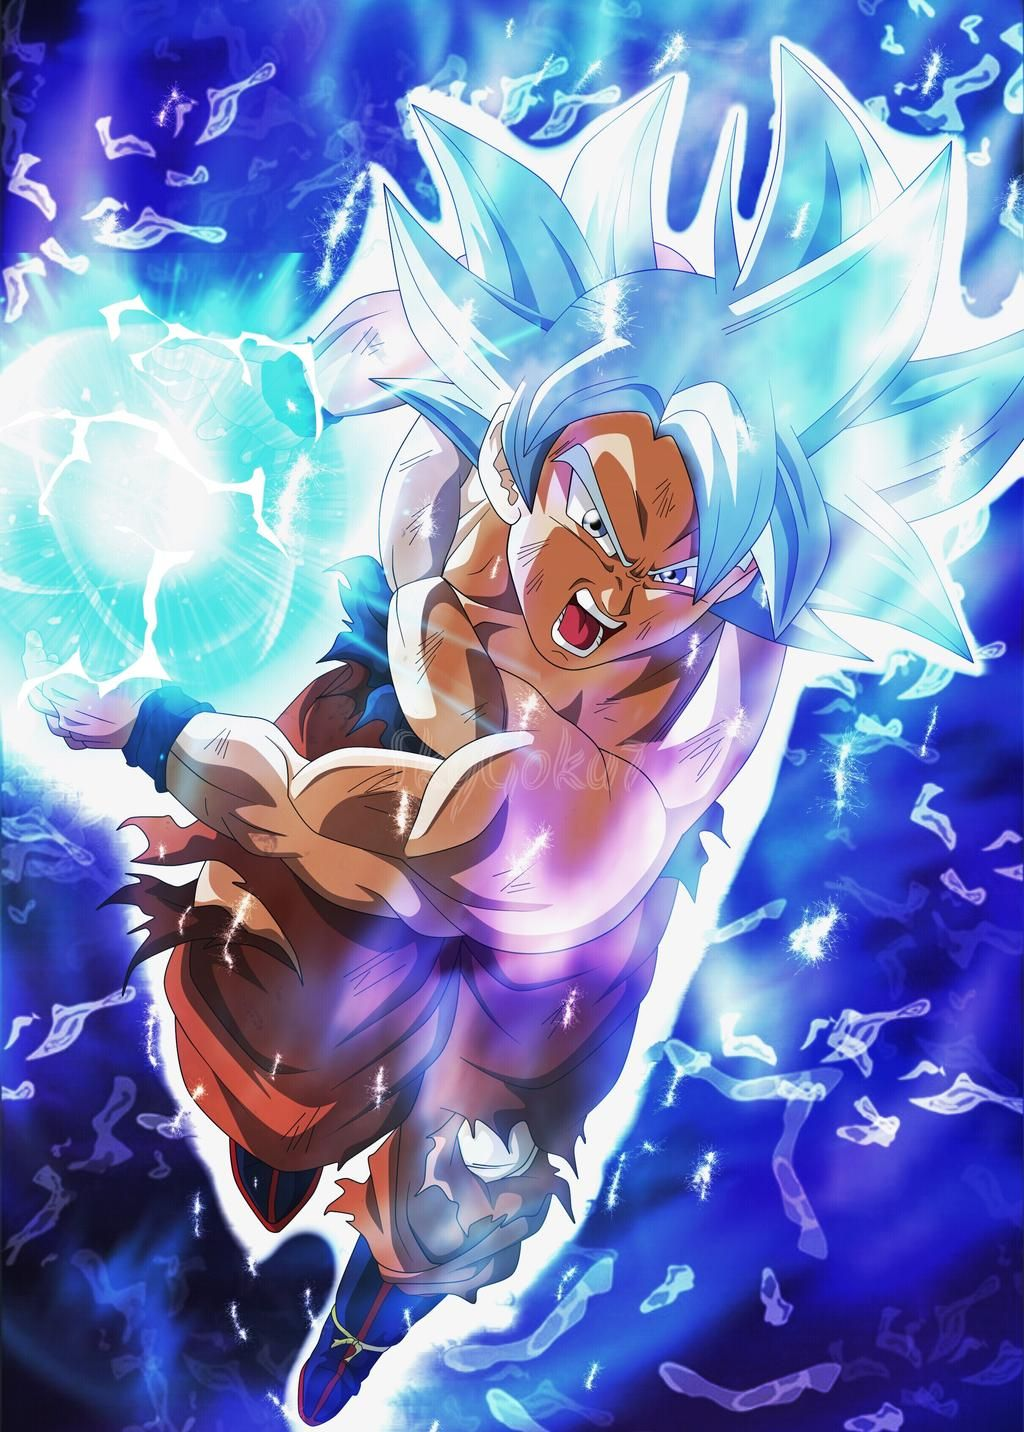 Ultra Instinct Goku Kamehameha By Skygoku7 On Deviantart Dragon Ball Super Artwork Dragon Ball Super Goku Anime Dragon Ball Super